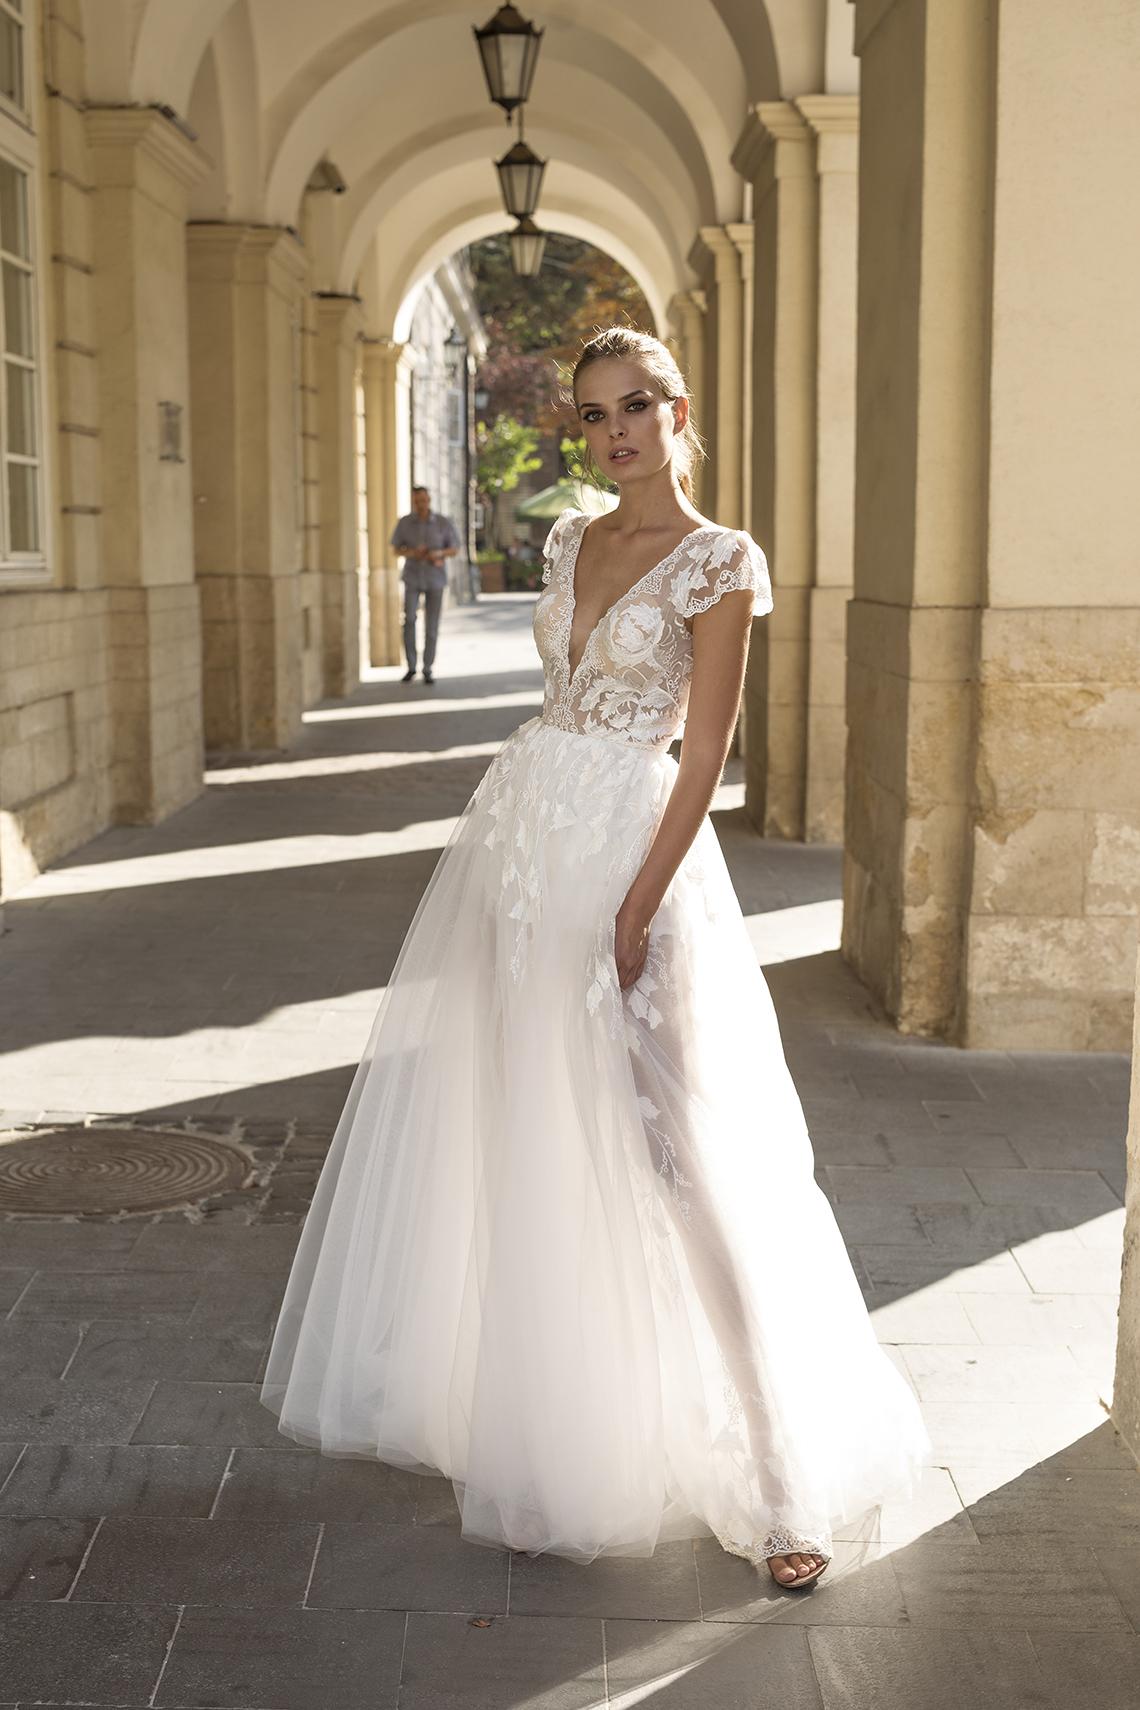 Riki Dalal Amor Wedding Dress Collection – Camen Dress 3